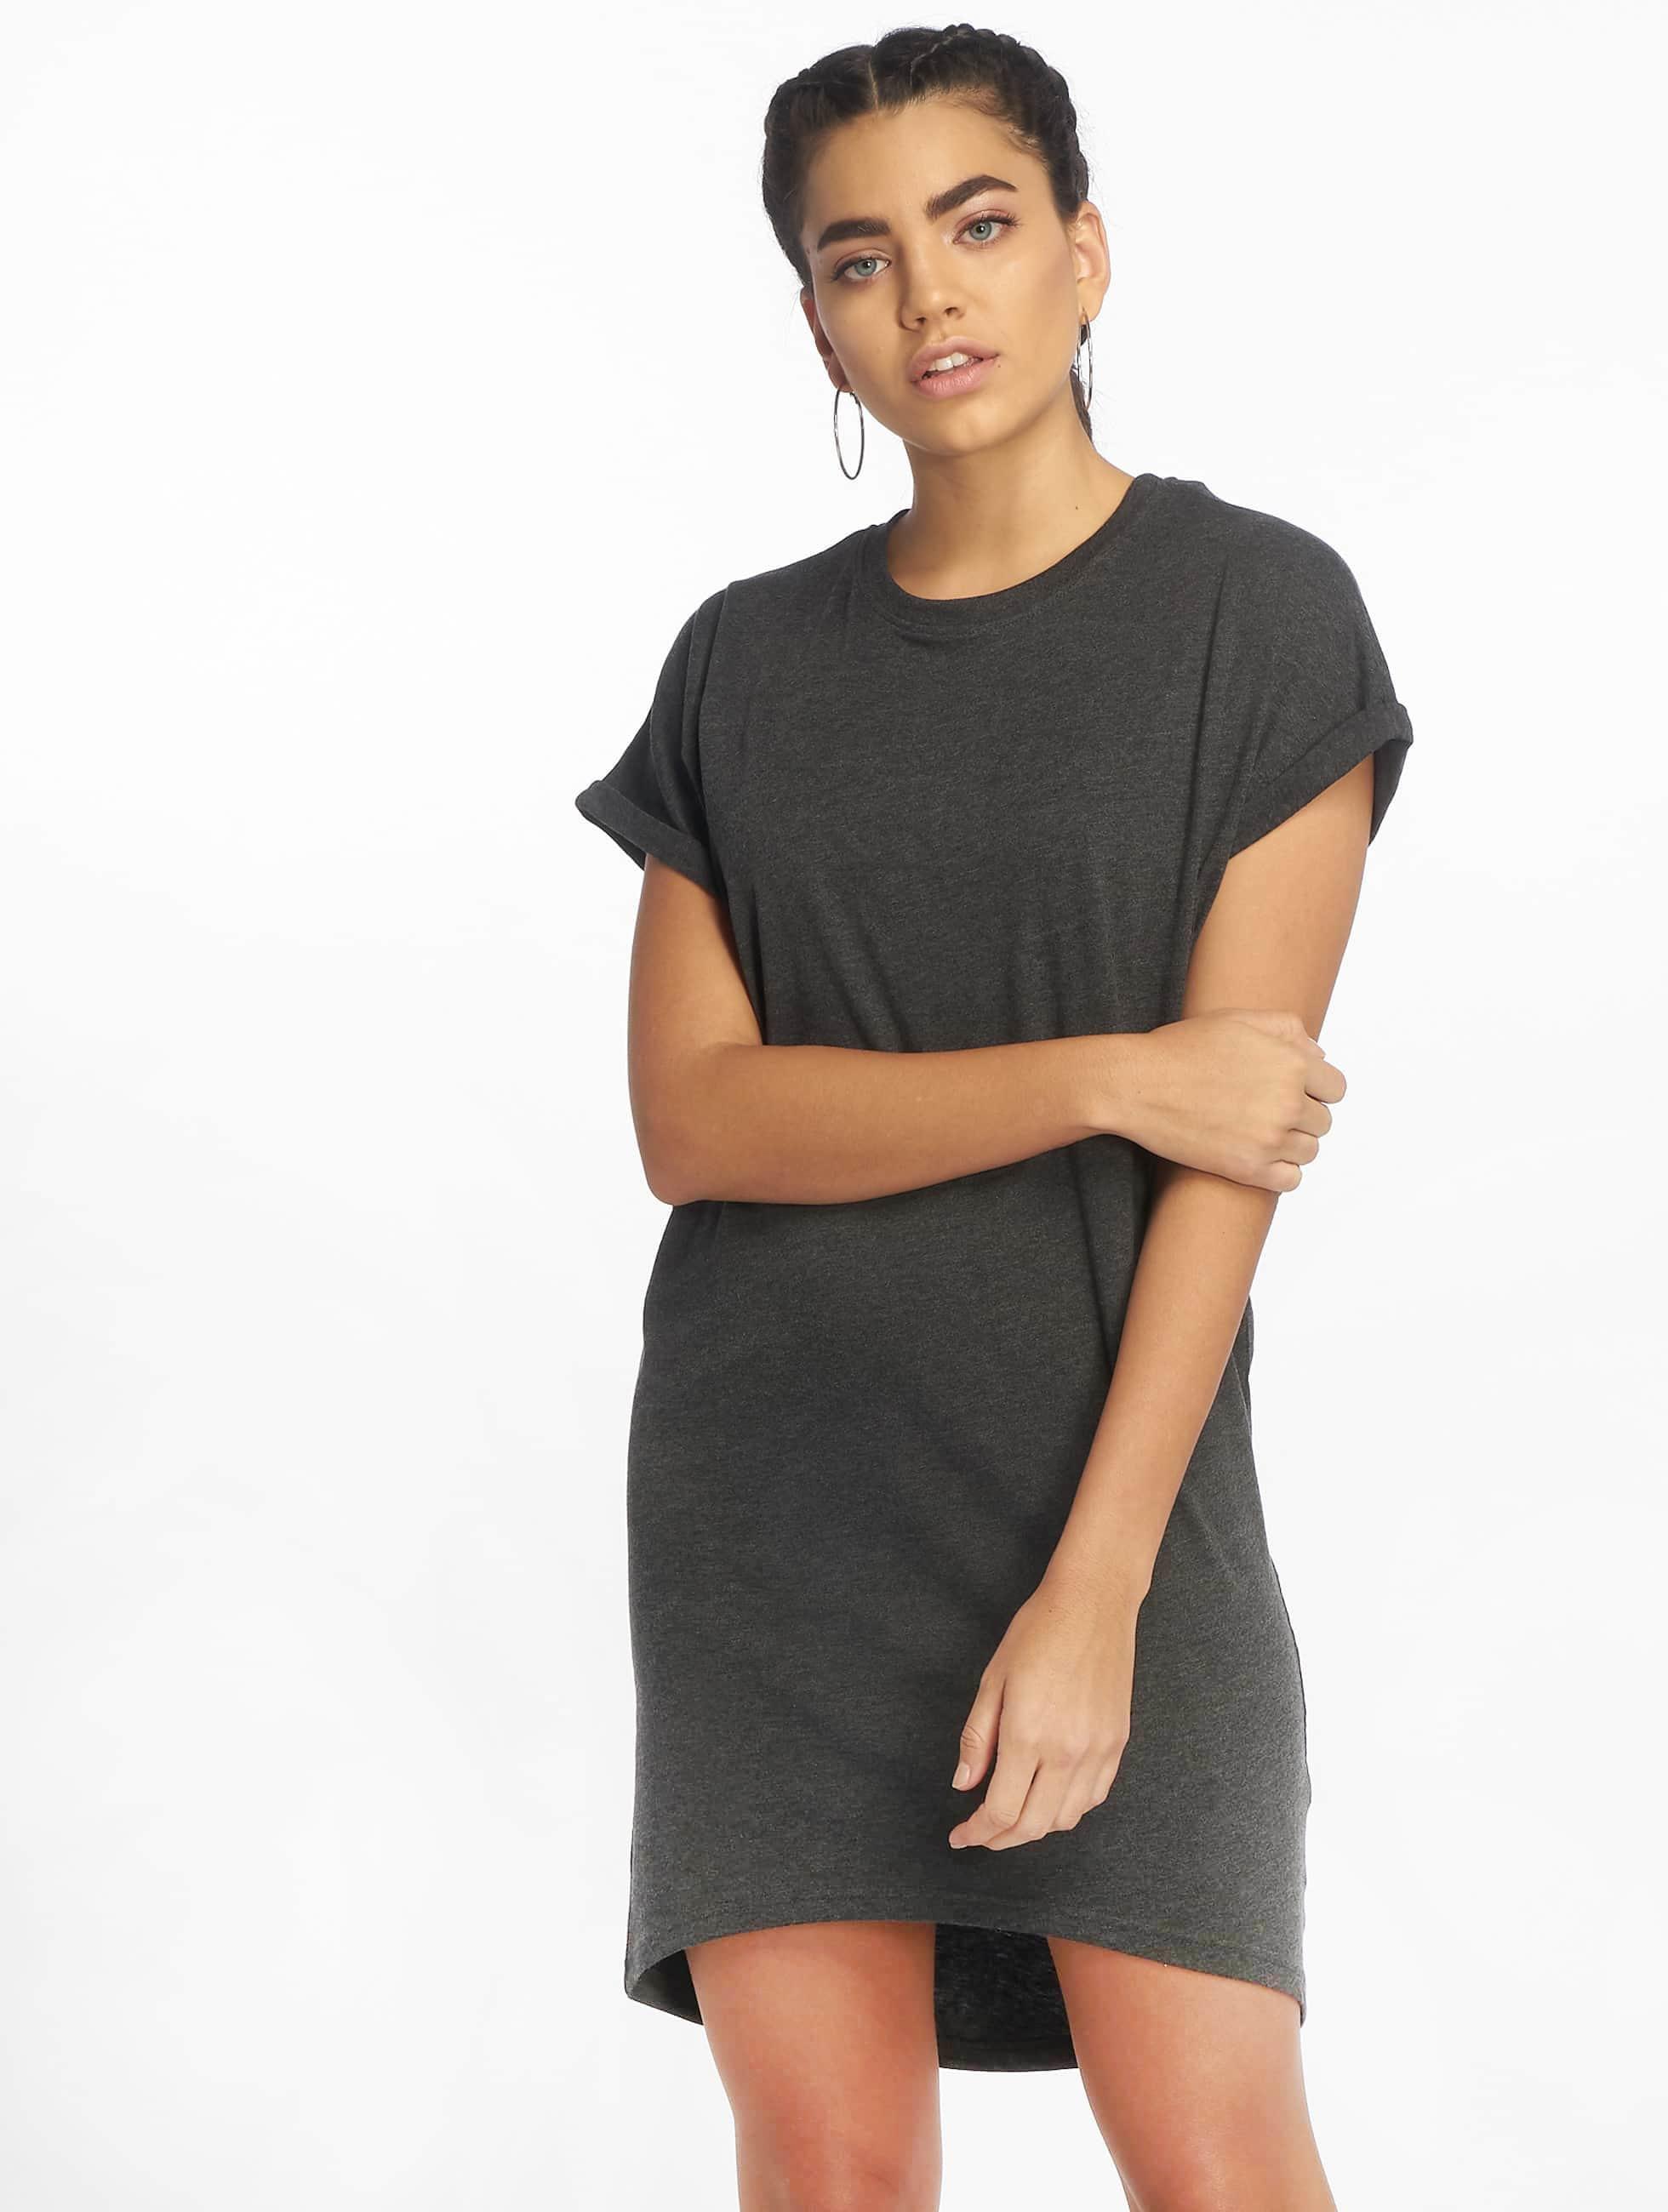 Def Damen Kleid Agung In Grau 594548